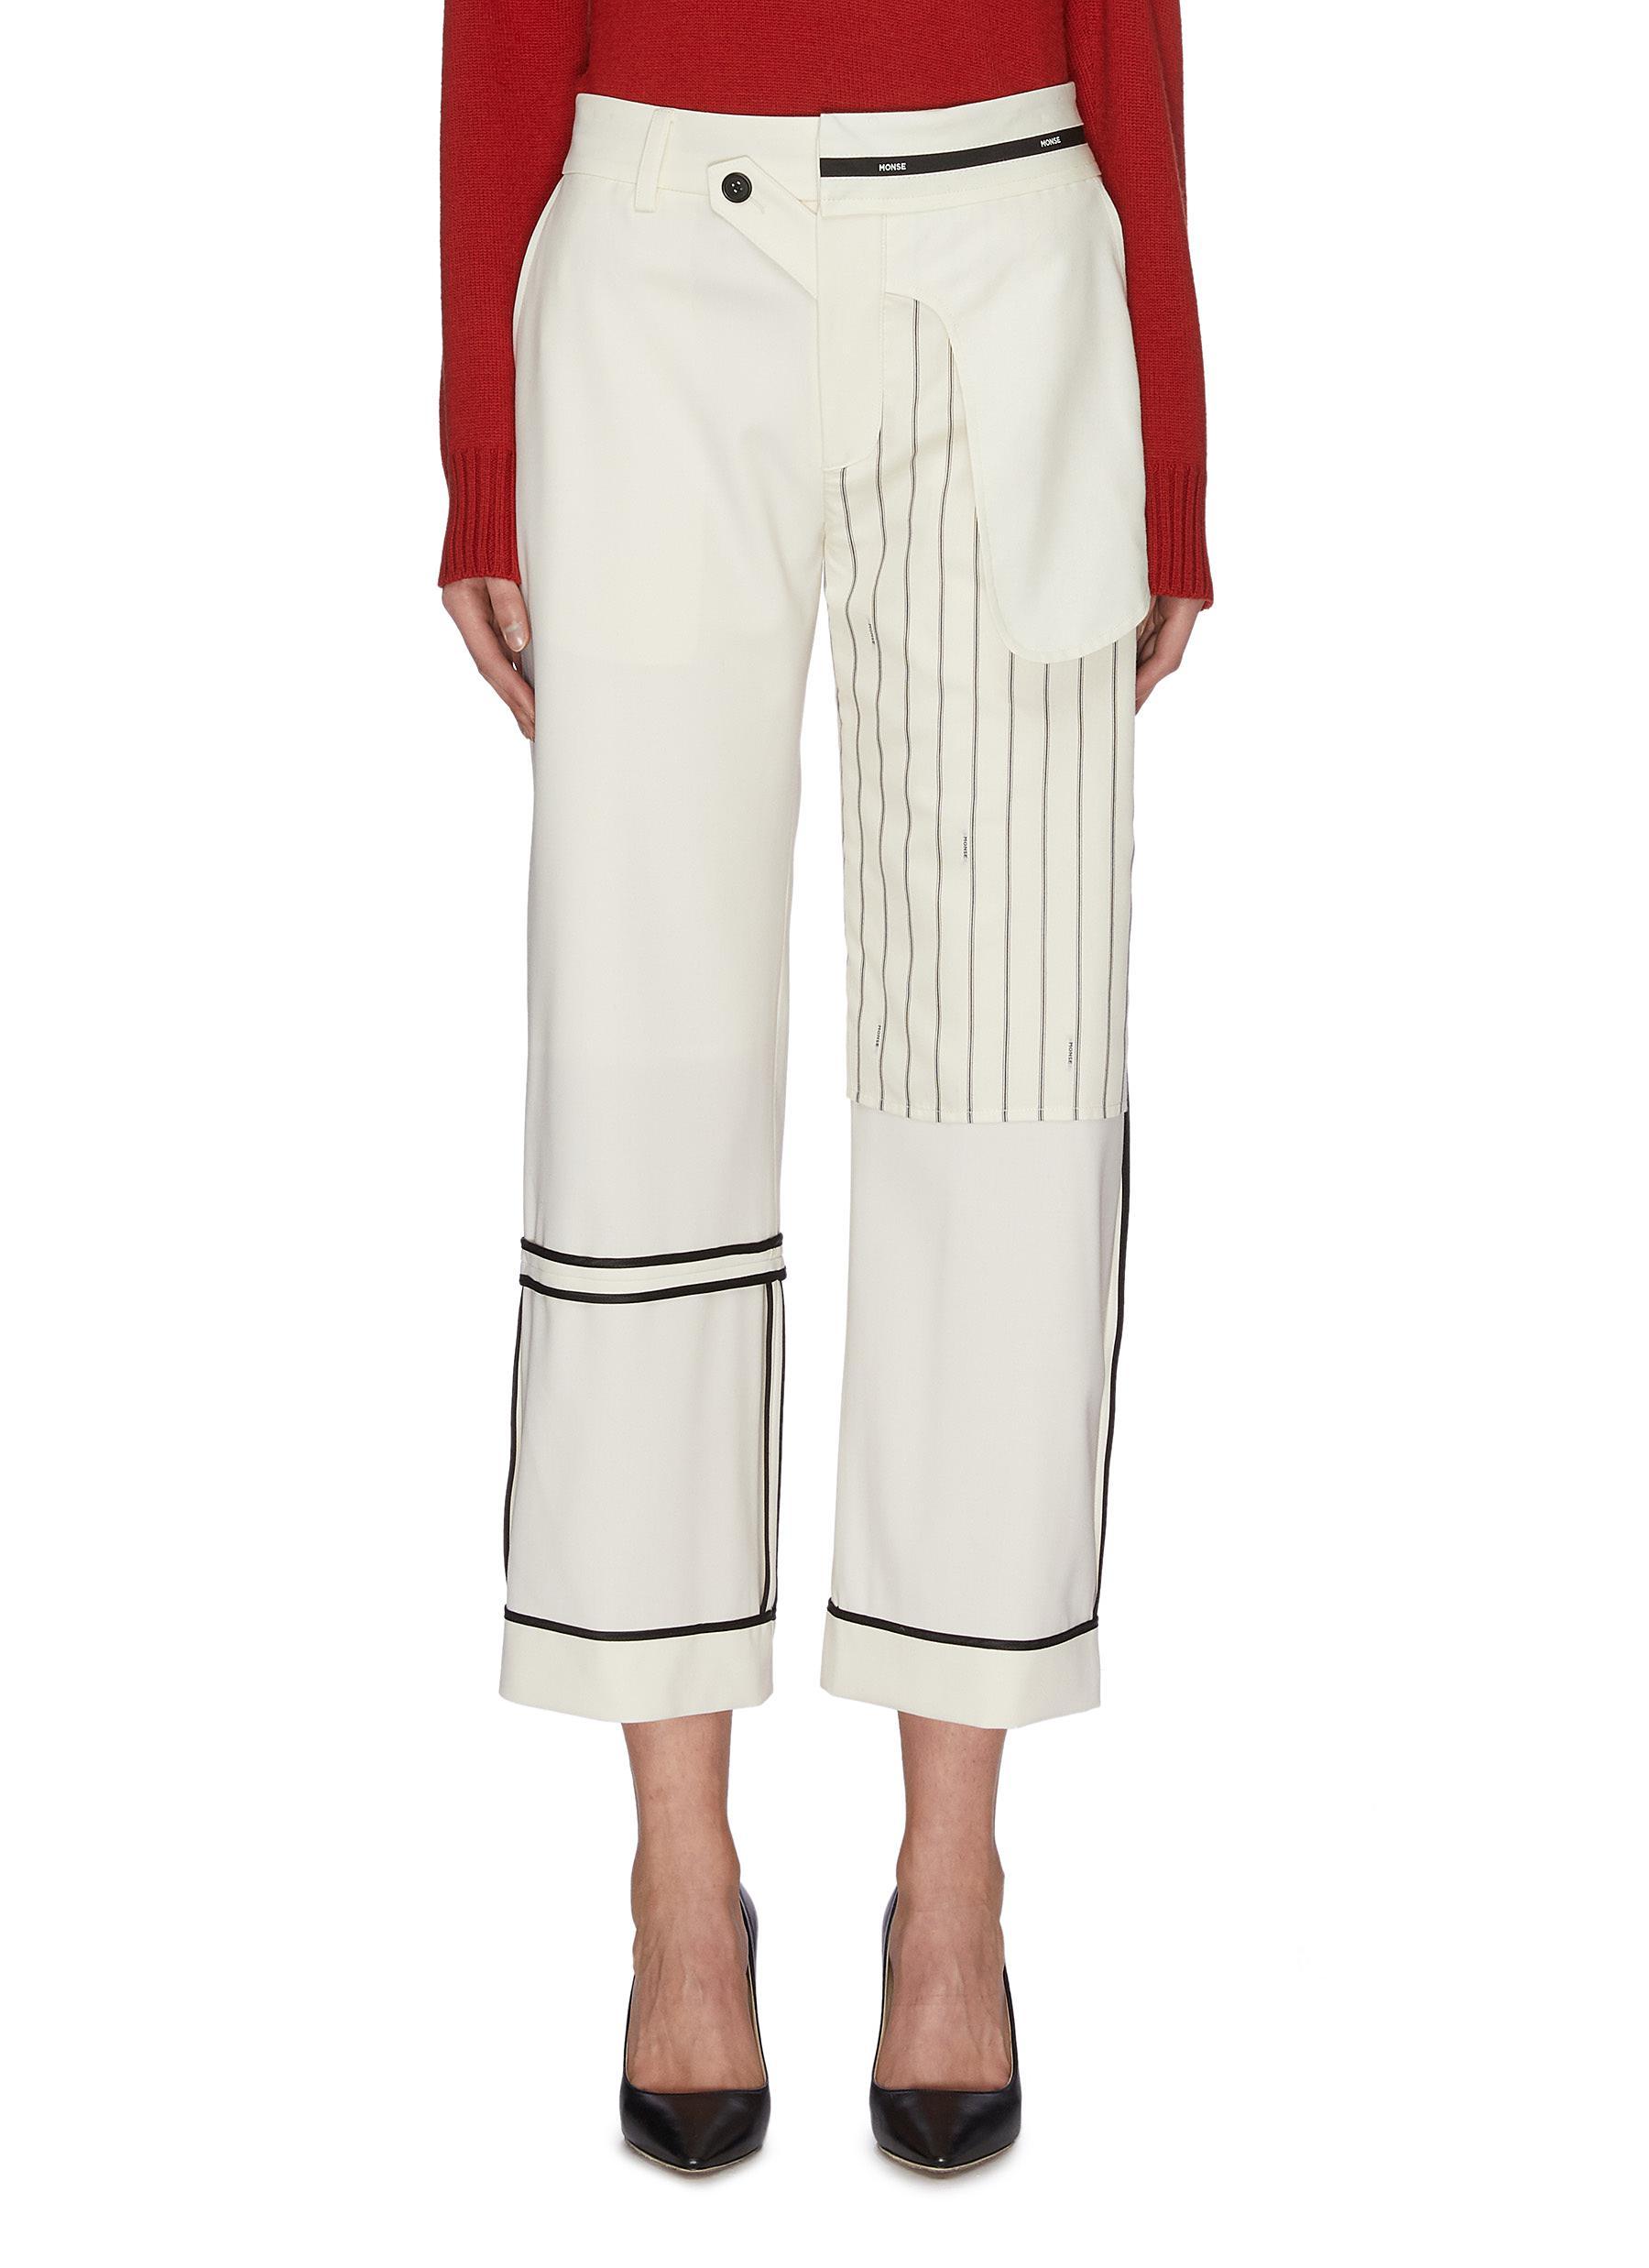 Buy Monse Pants & Shorts 'Inside out' patchwork pants